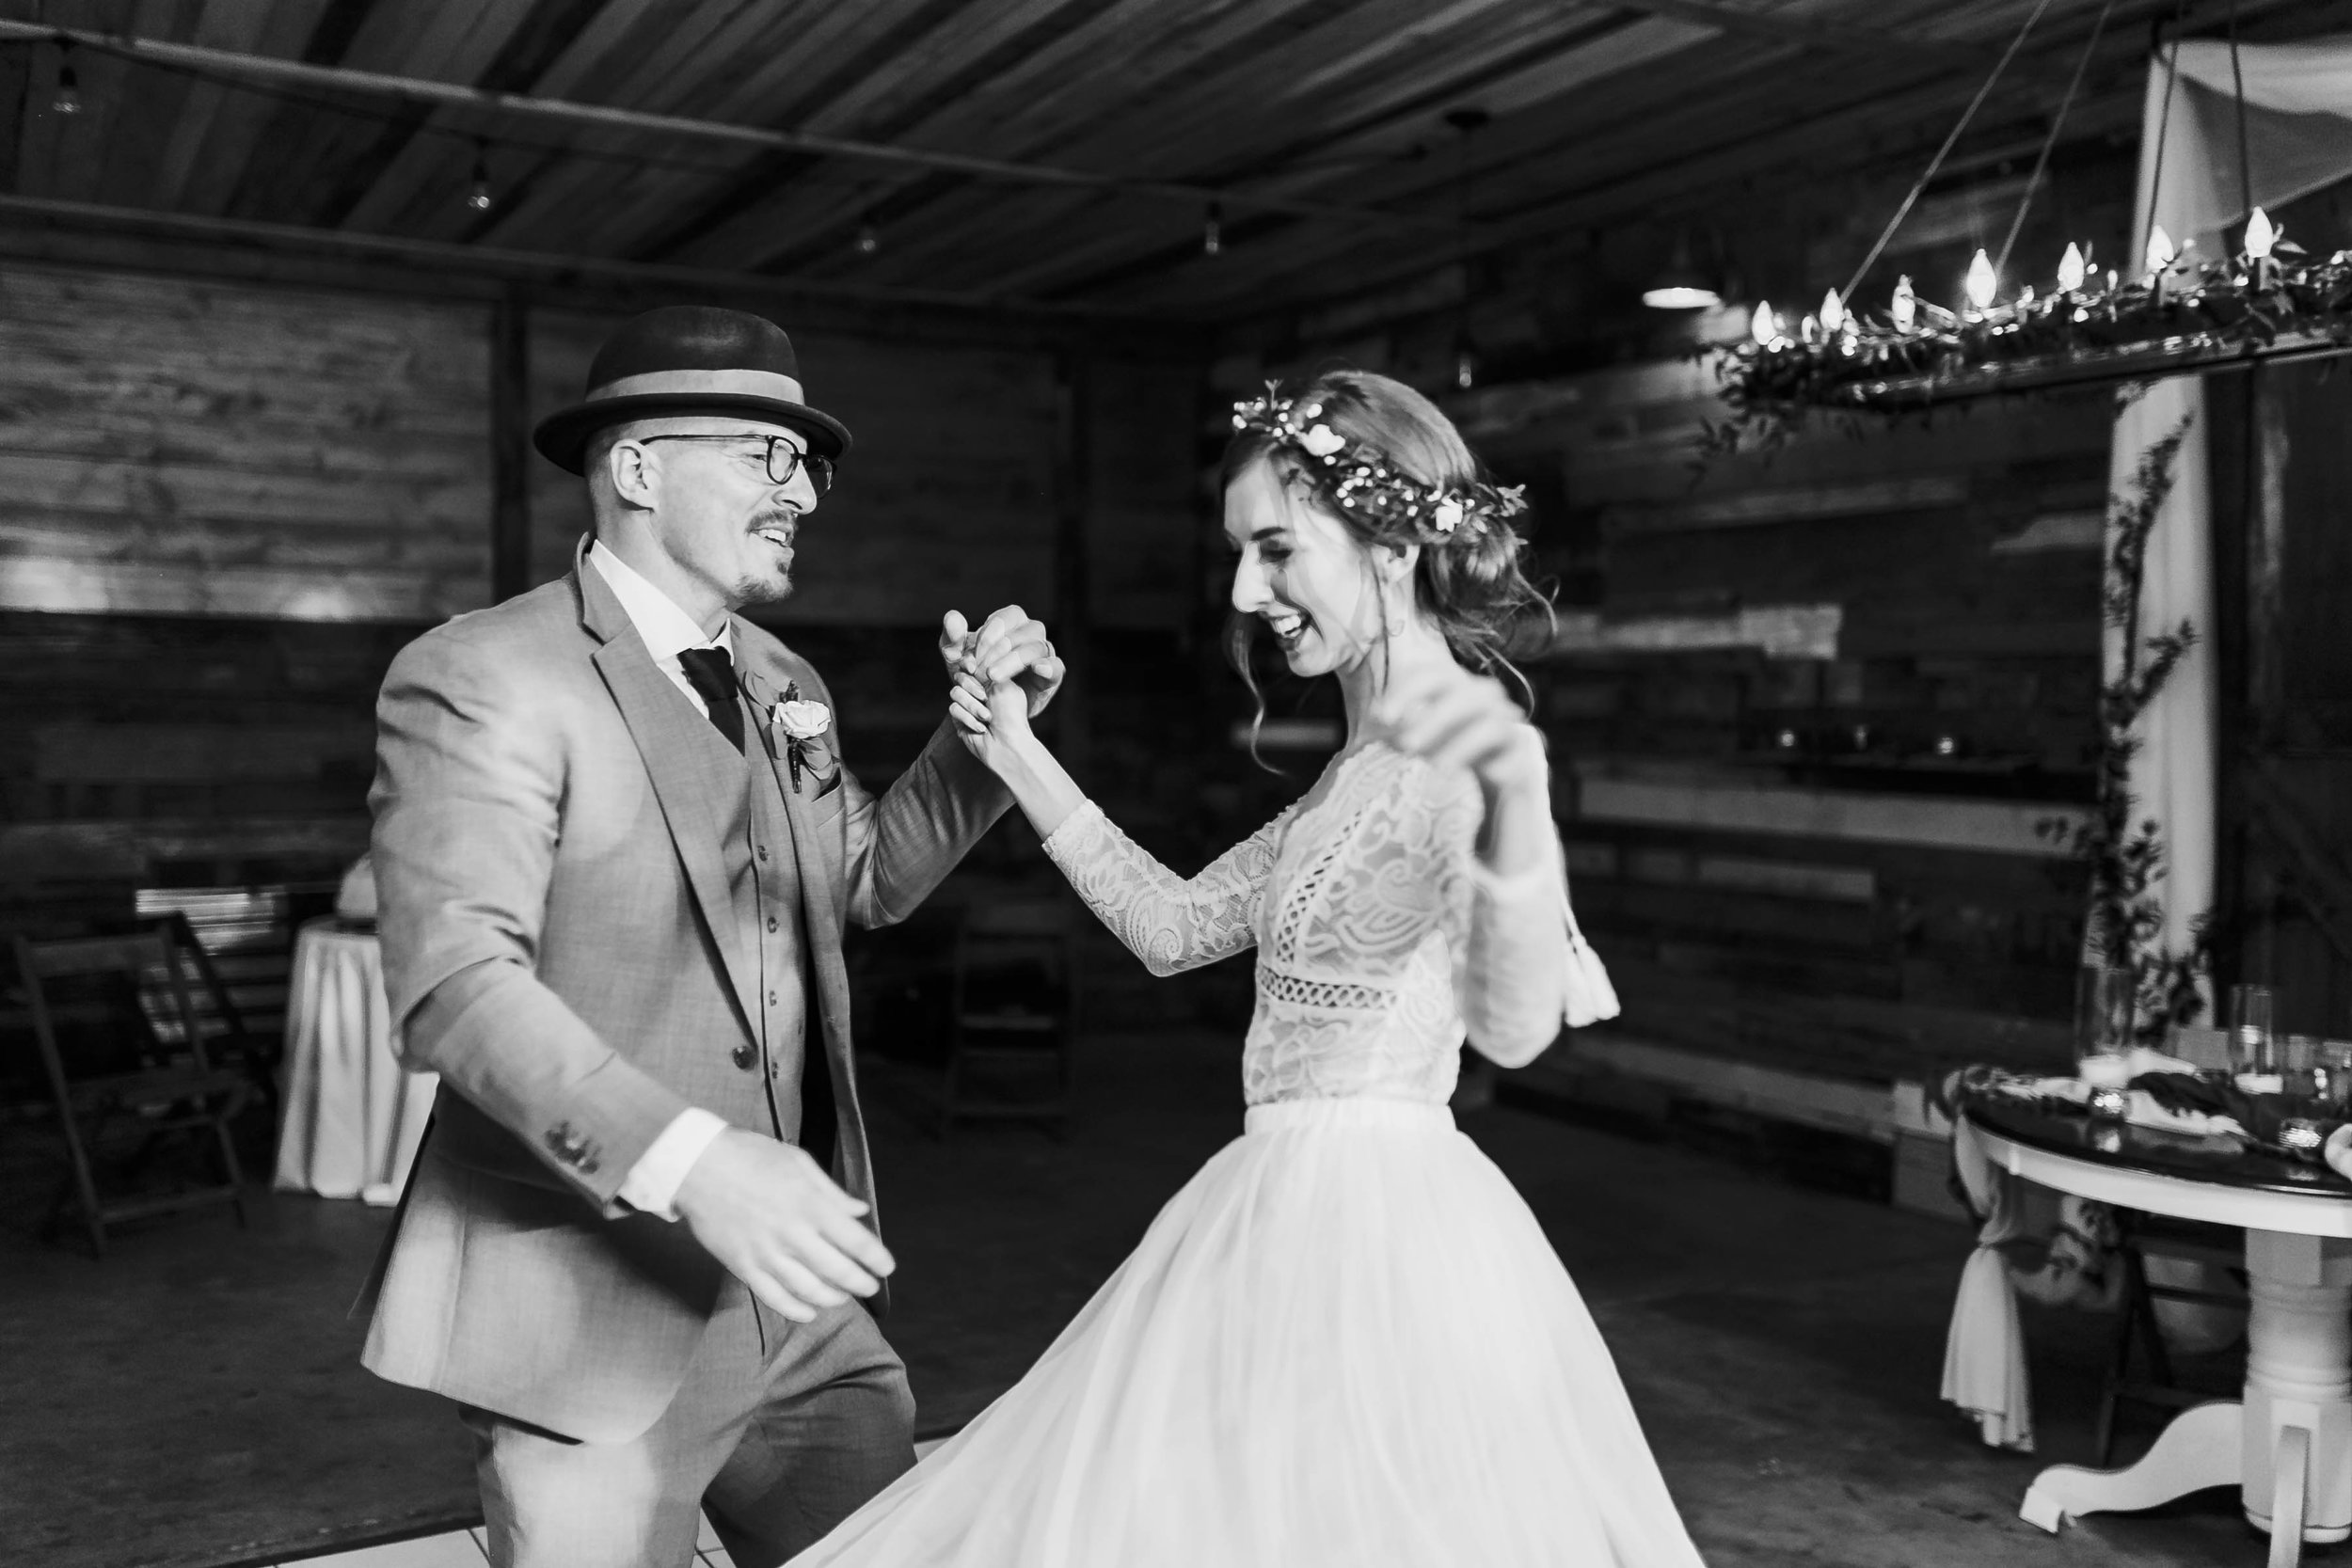 armstrong-wedding-807.jpg